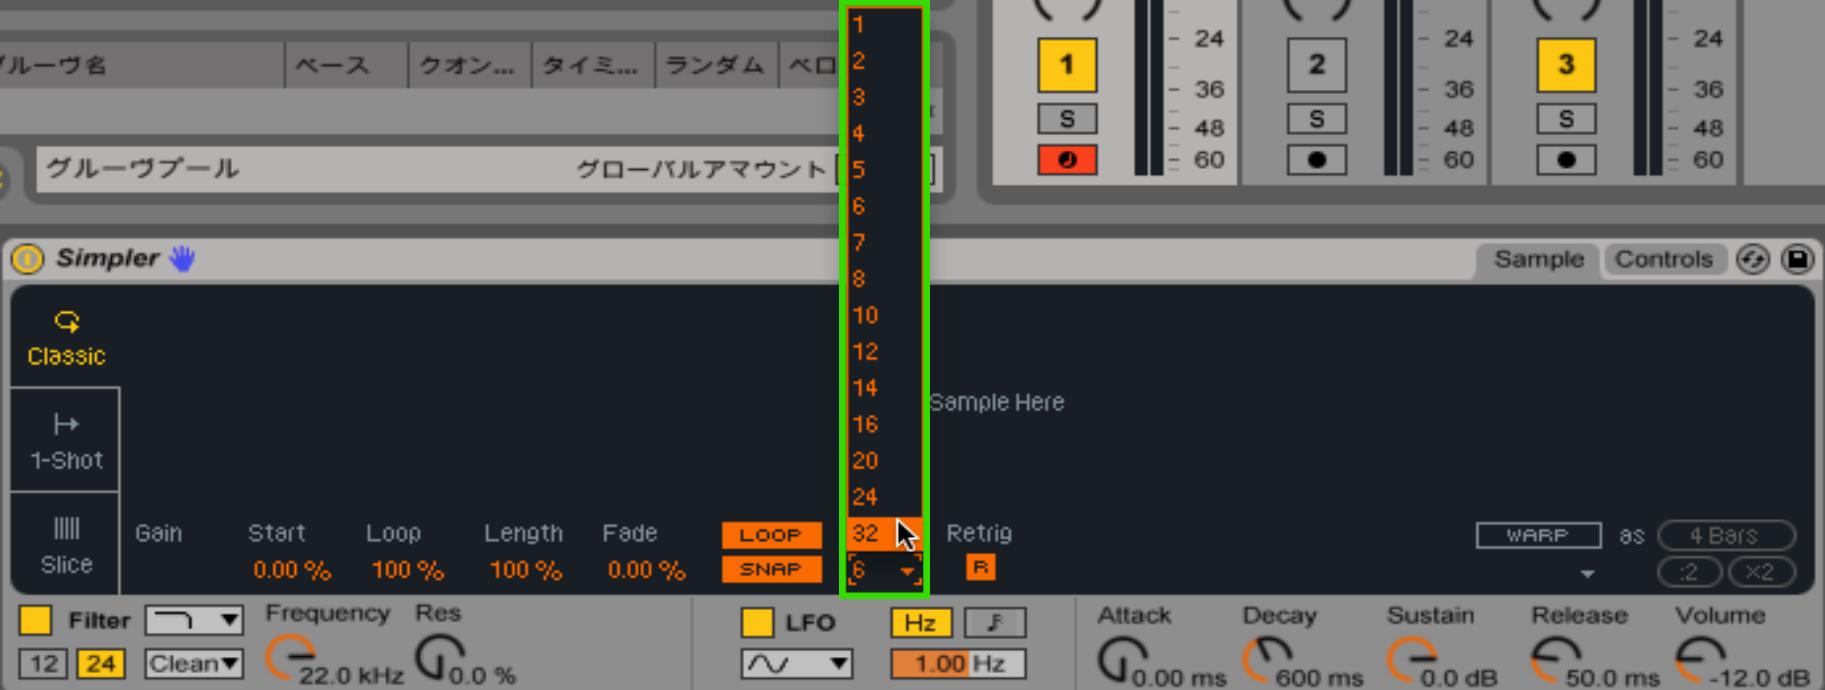 Simpler_Voice数の変更